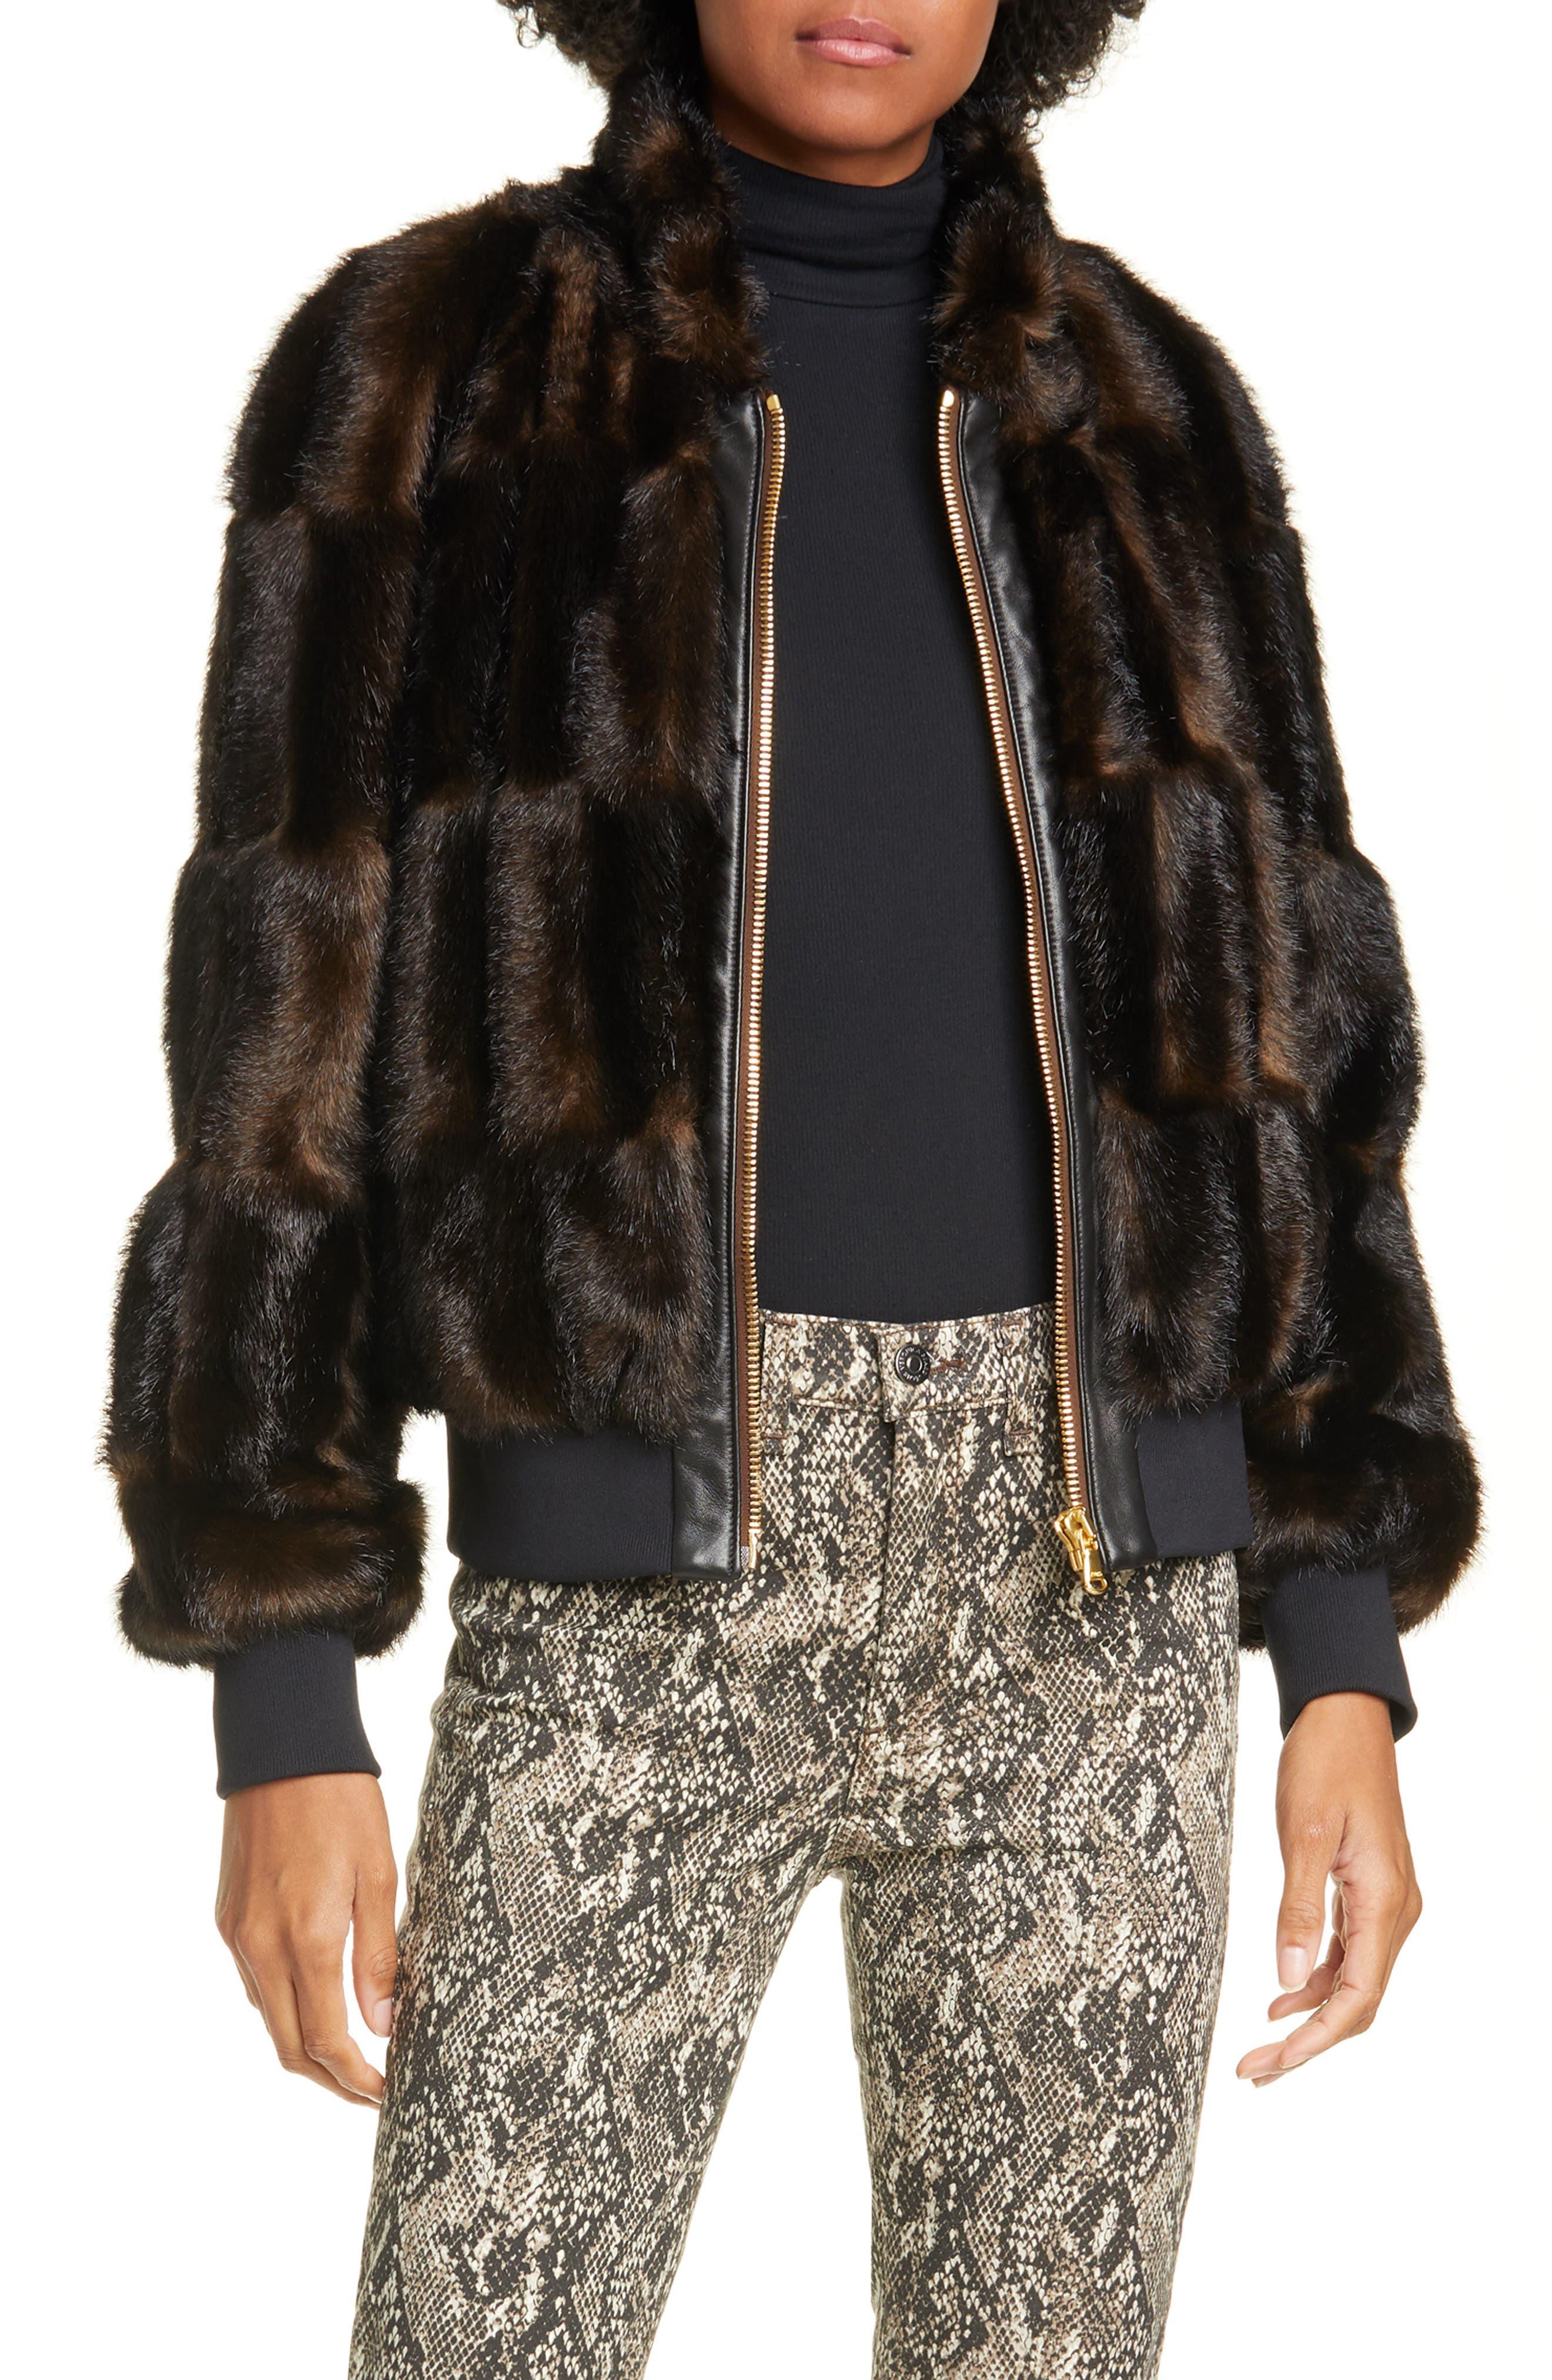 Veronica Beard Coats Bellfire Faux Fur Bomber Jacket